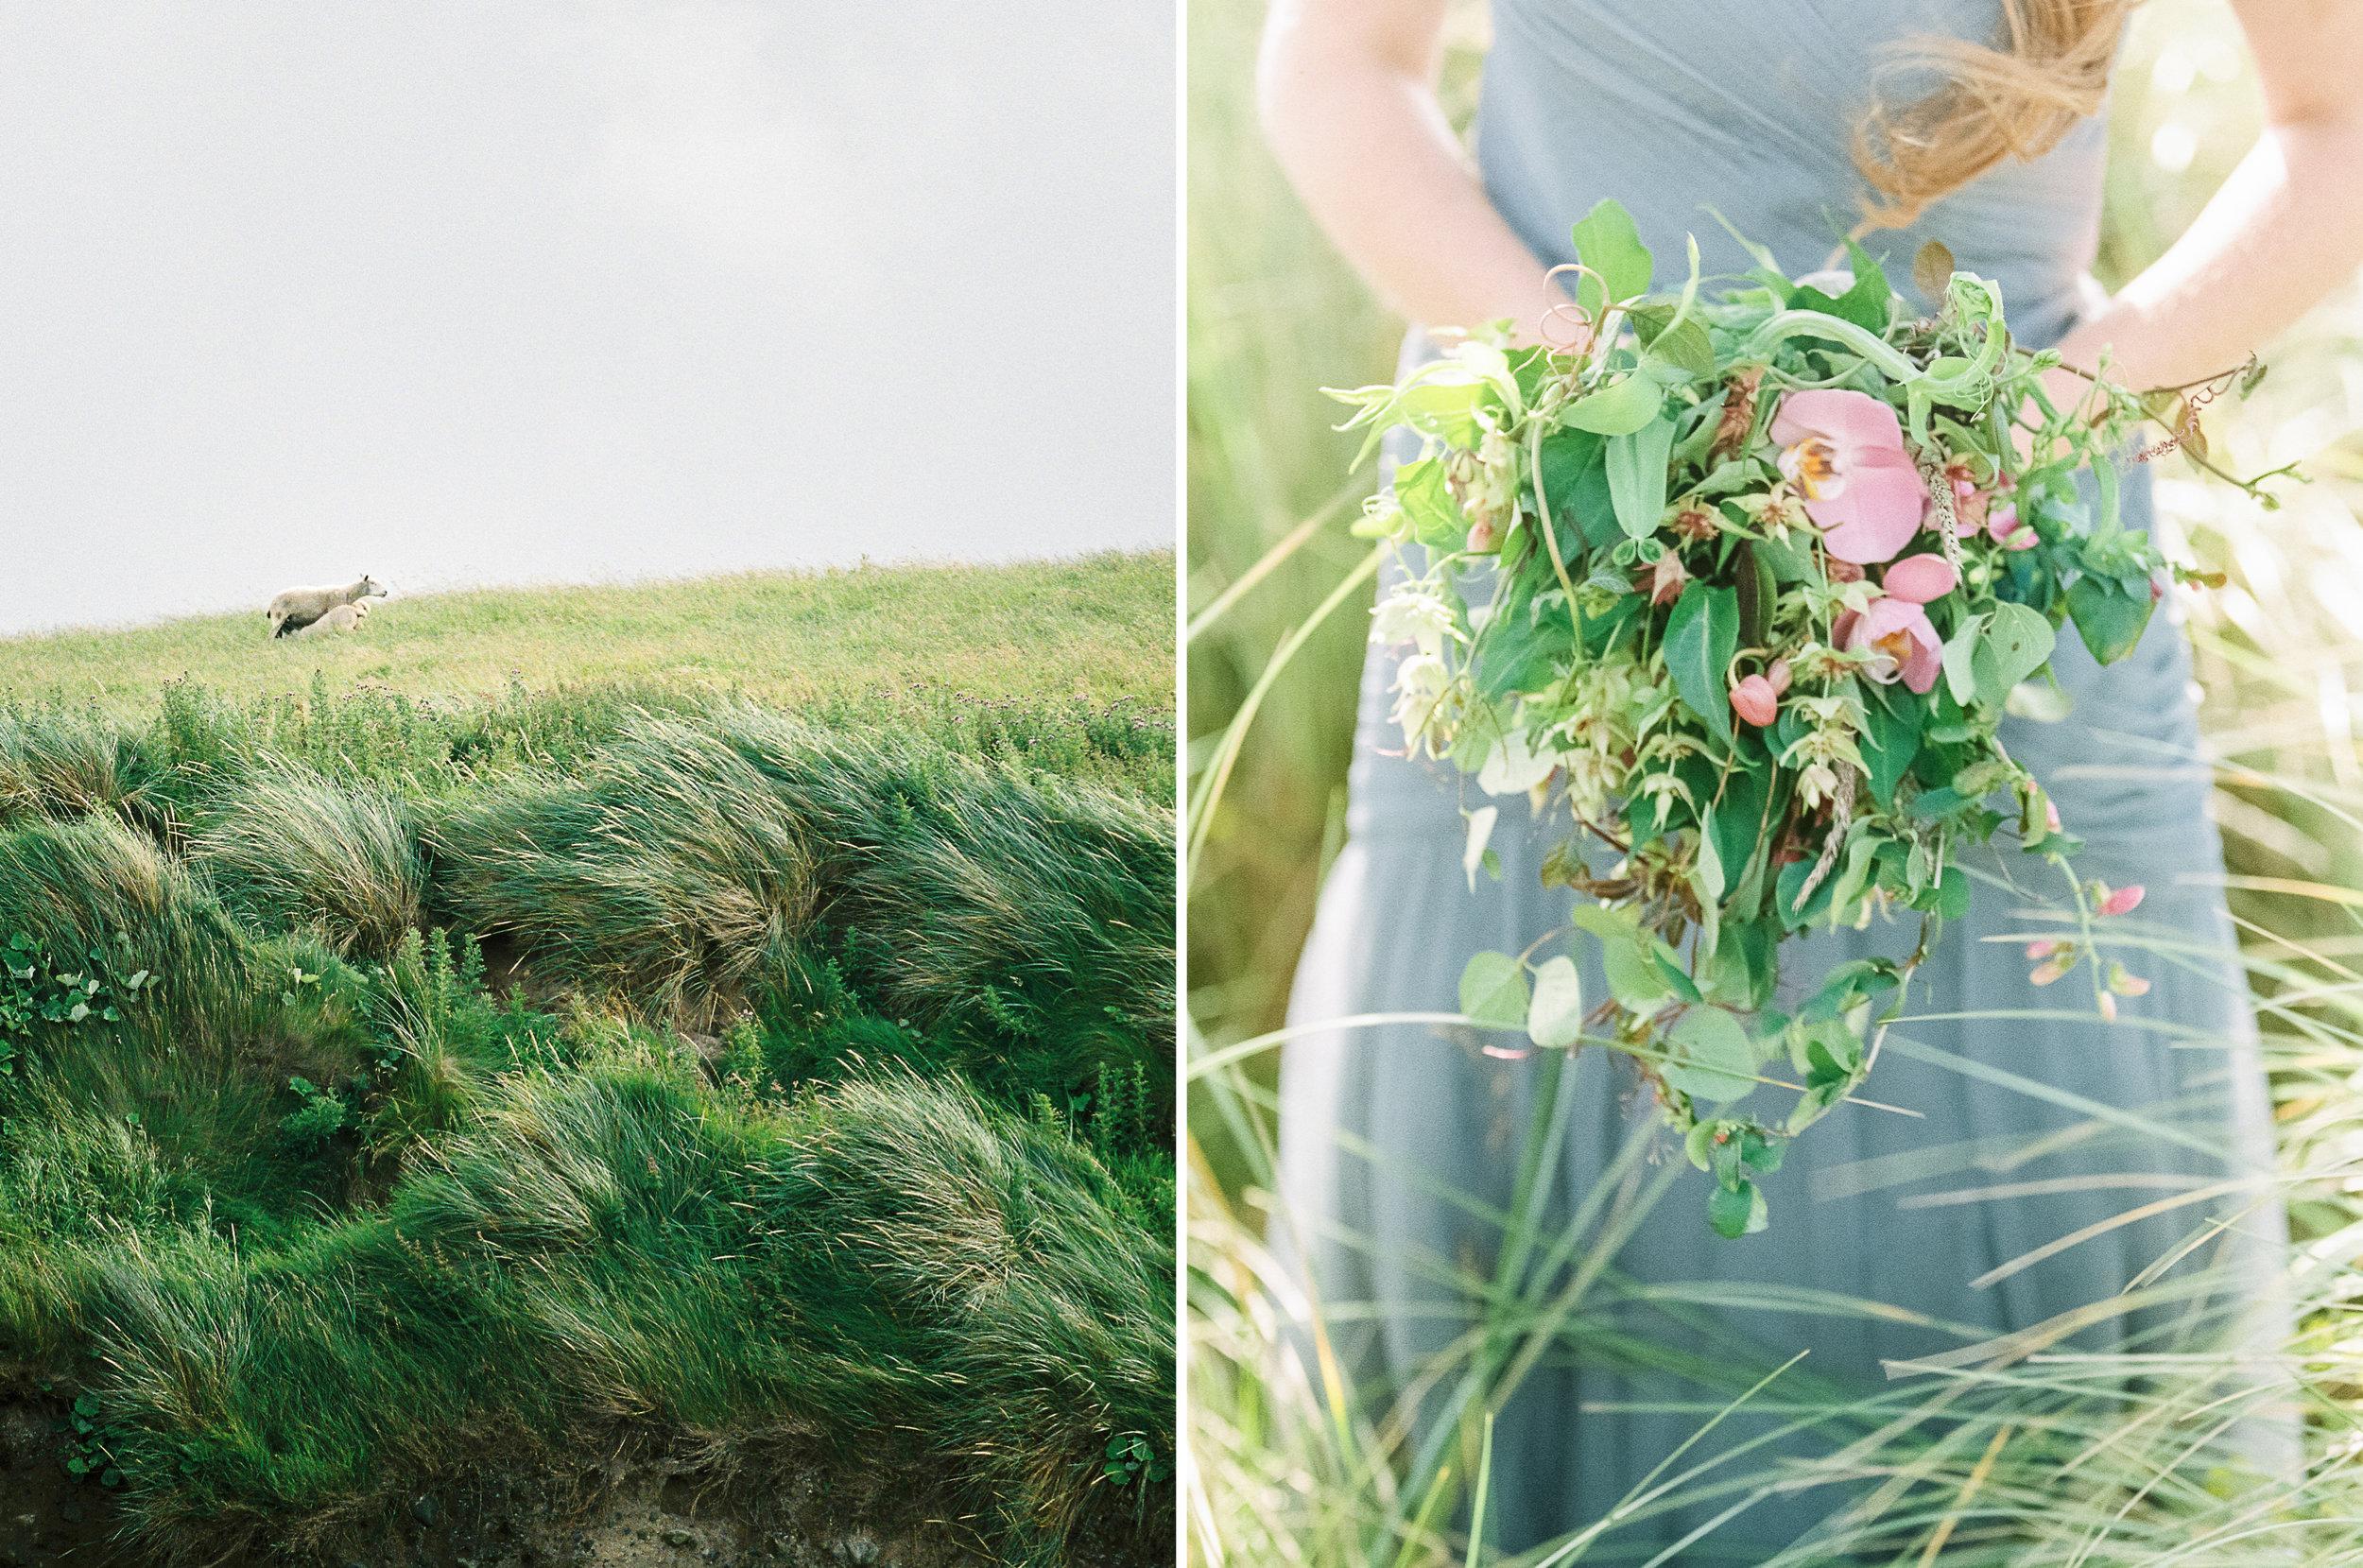 Chen-Sands-Film-Photography-Portraits-Engagement-Elopment-Ireland-Diptych-4.jpg